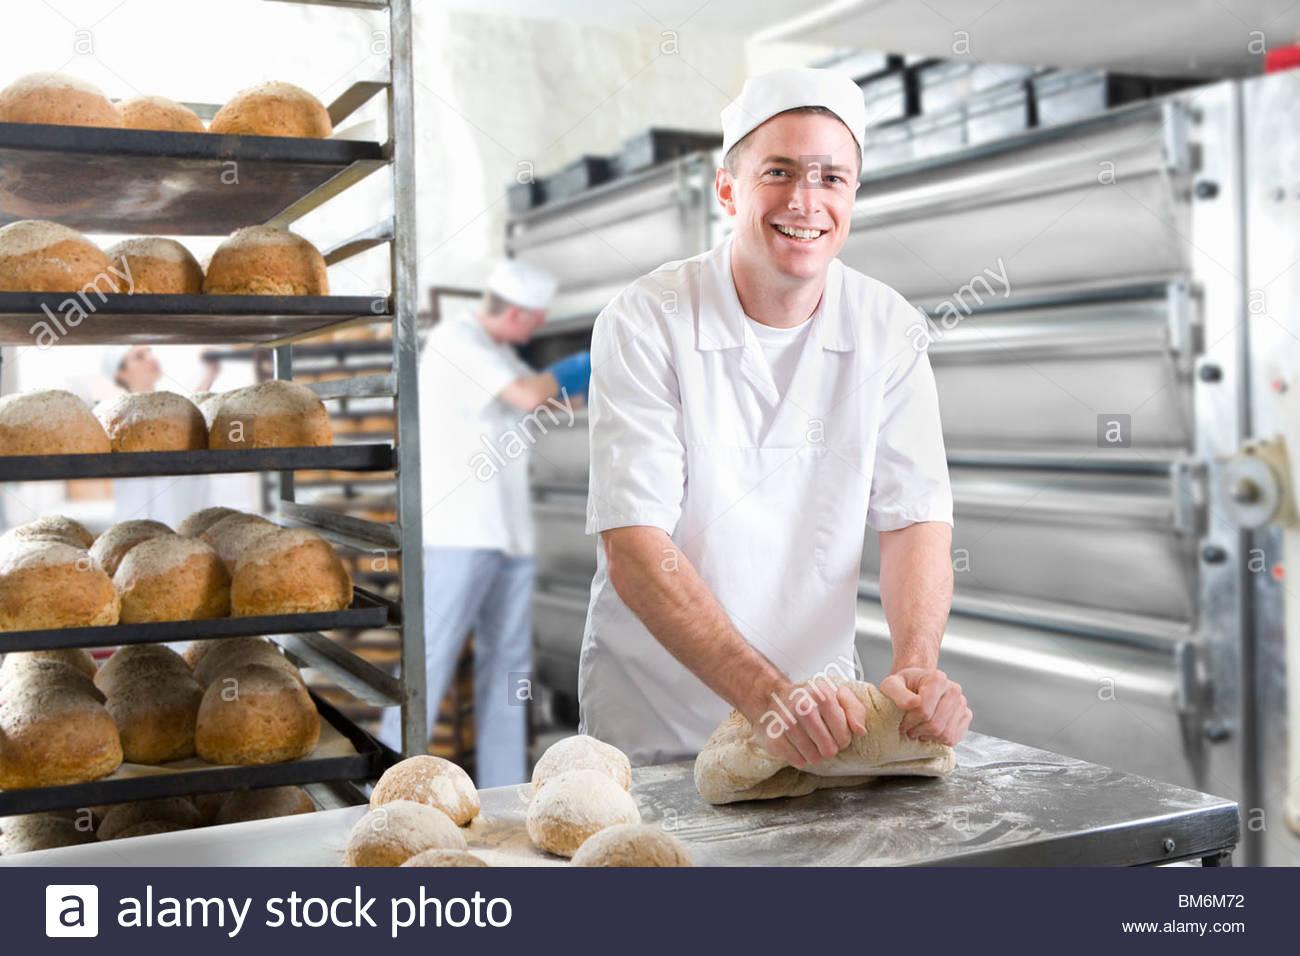 Baker Kneading Bread Dough In Bakery Stock Photo 29651078